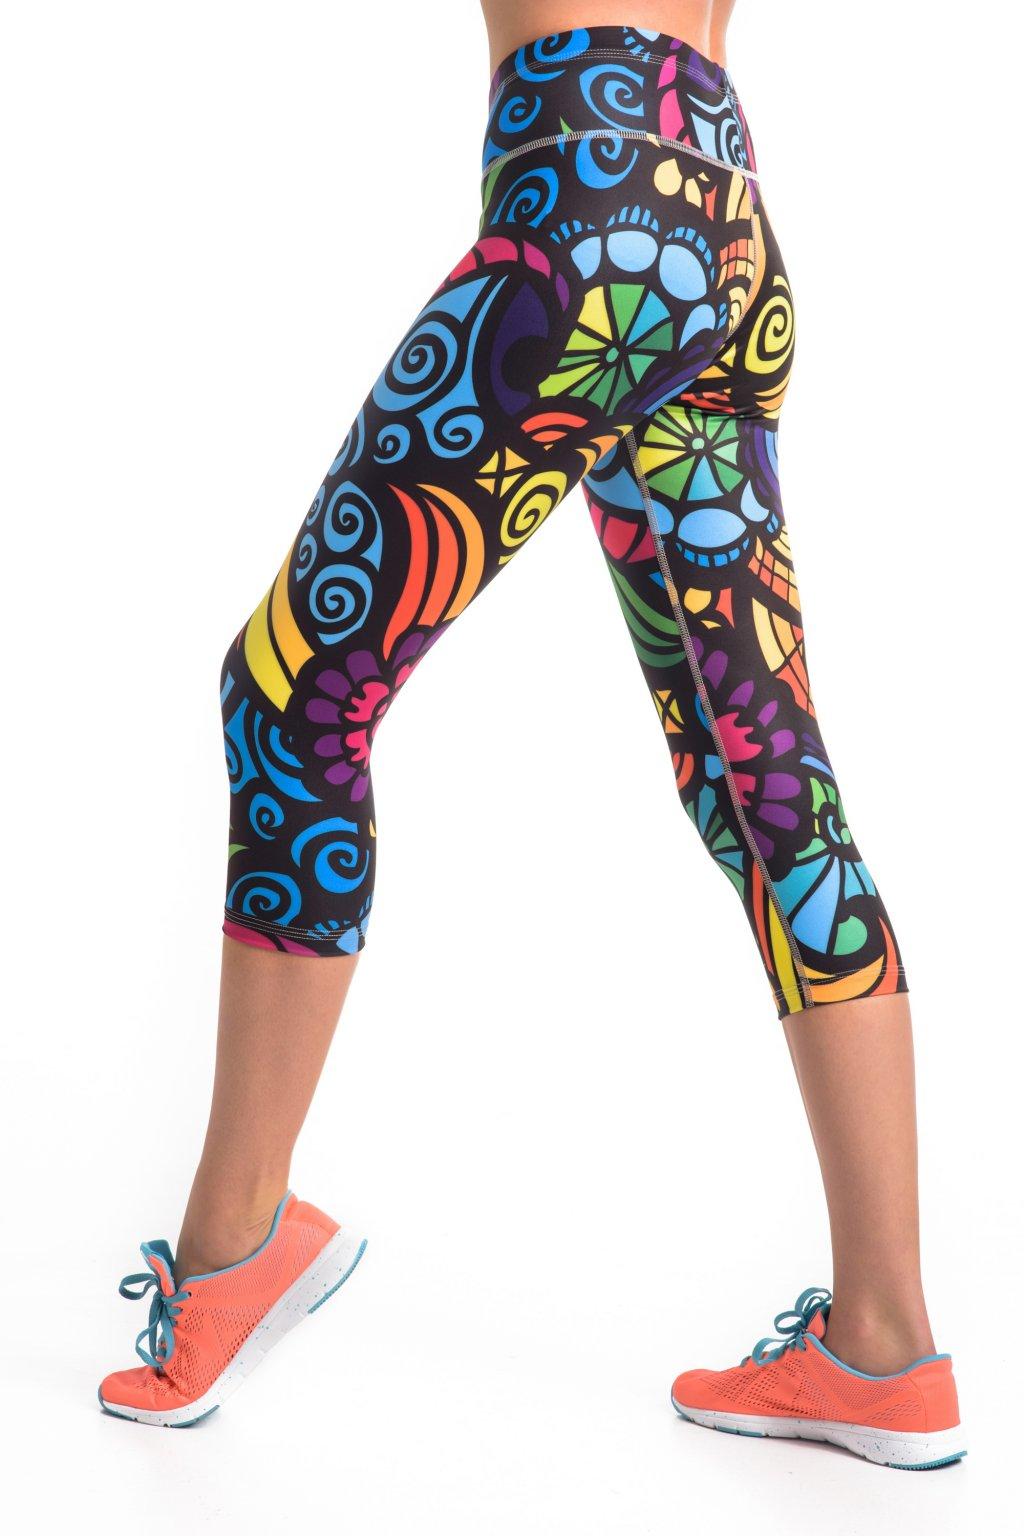 Krátké Běžecké Fitness Legíny OSTK04L - Mosaic II - Nessi Sportswear cad9fbddc6